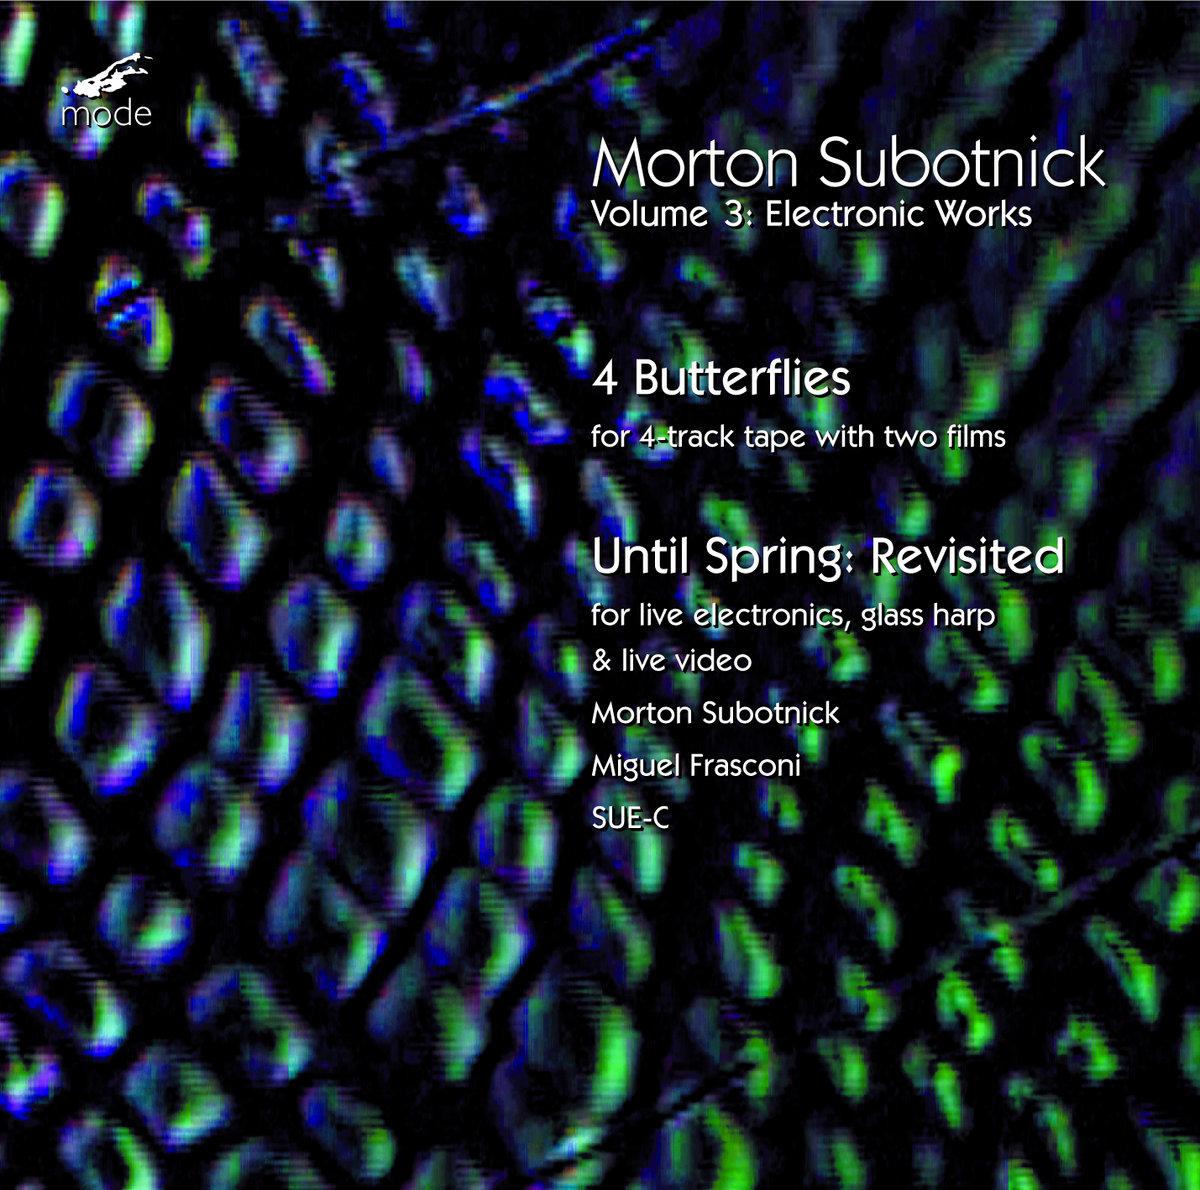 Morton Subotnick Vol. 3 : Electronic Works, by Morton Subotnick